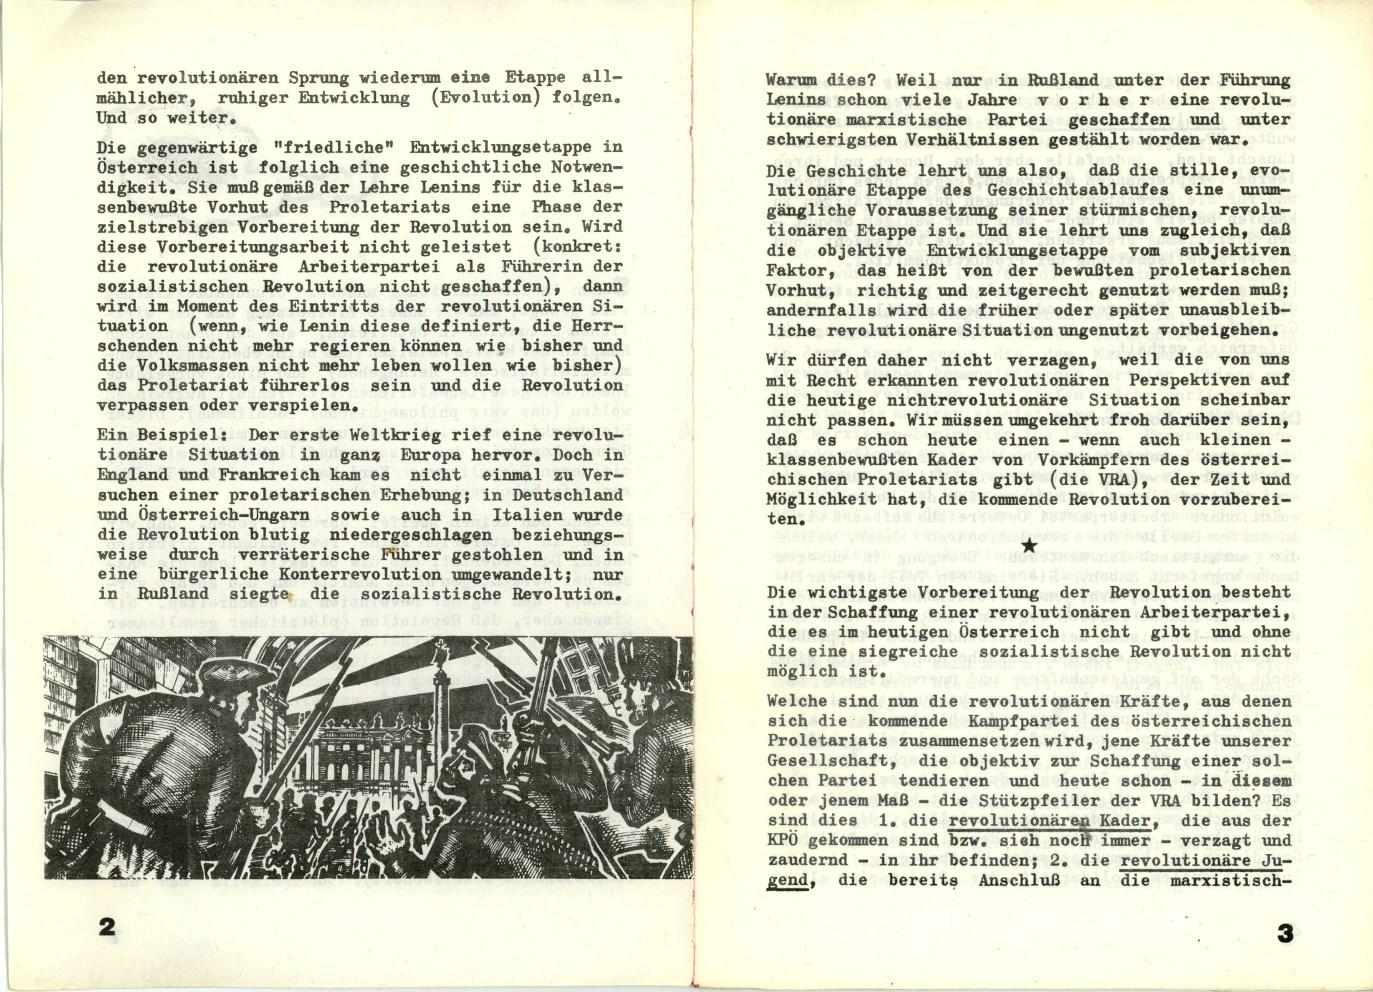 VRA_Perspektiven_1975_03